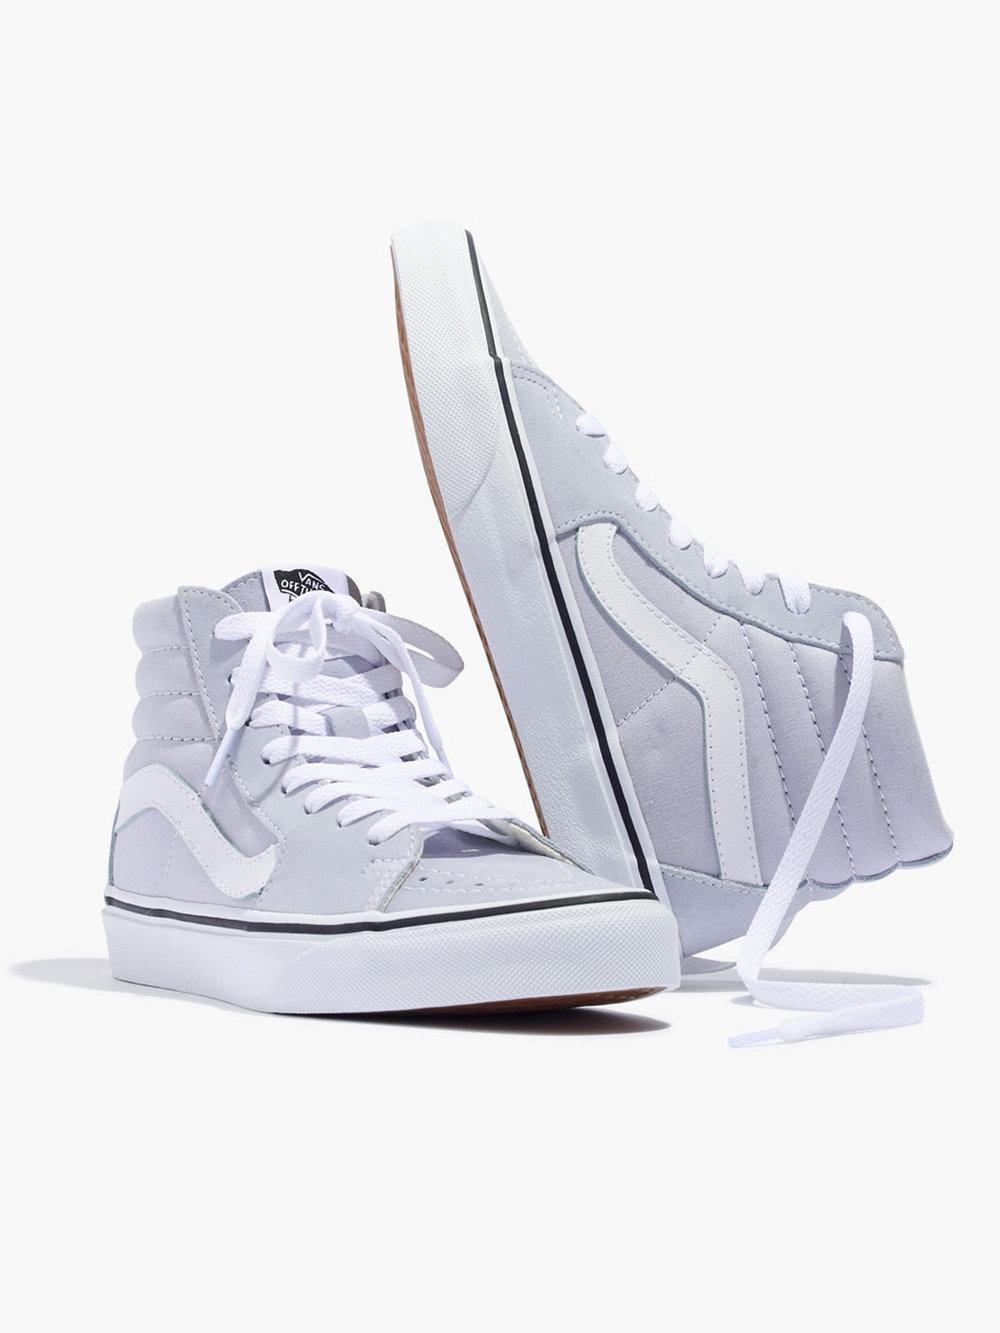 Vans® Sk8-Hi High-Top Sneakers, $65